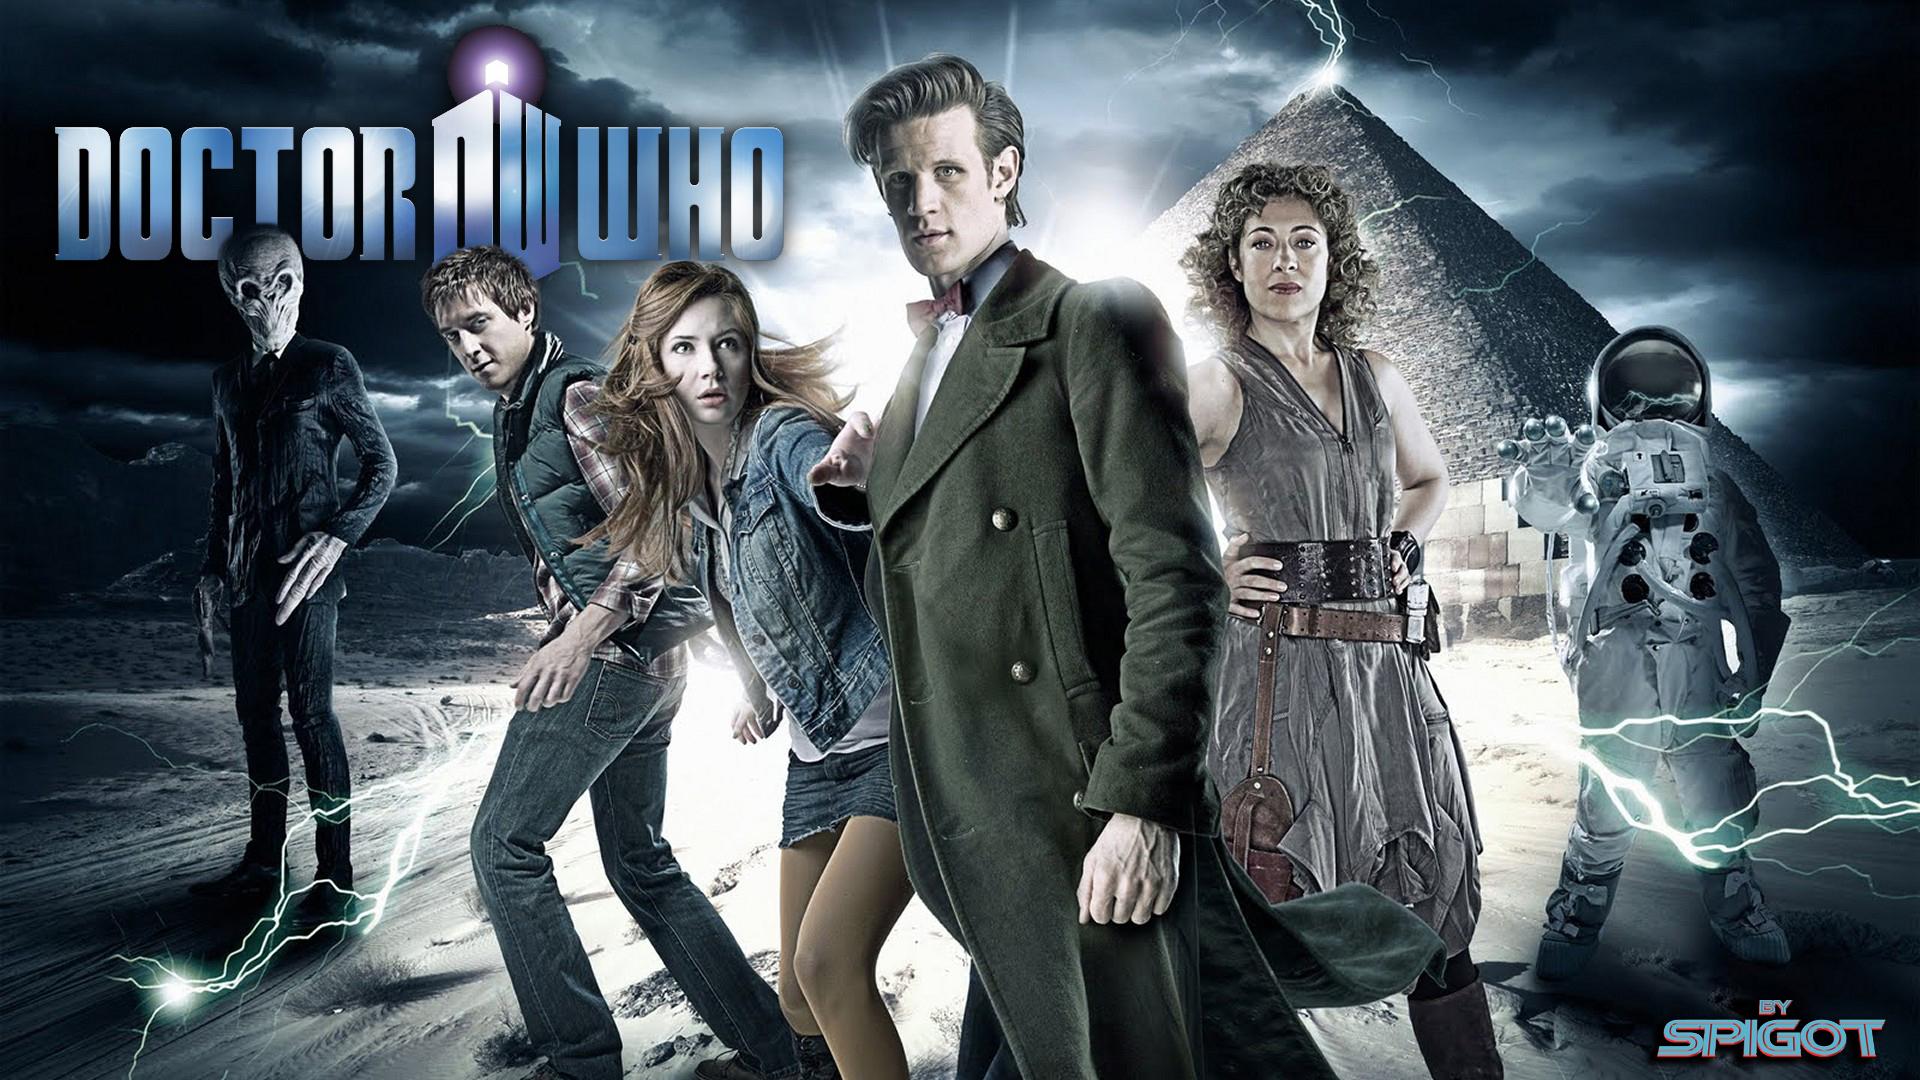 Dr Who Season 6 Wallpaper | George Spigot's Blog